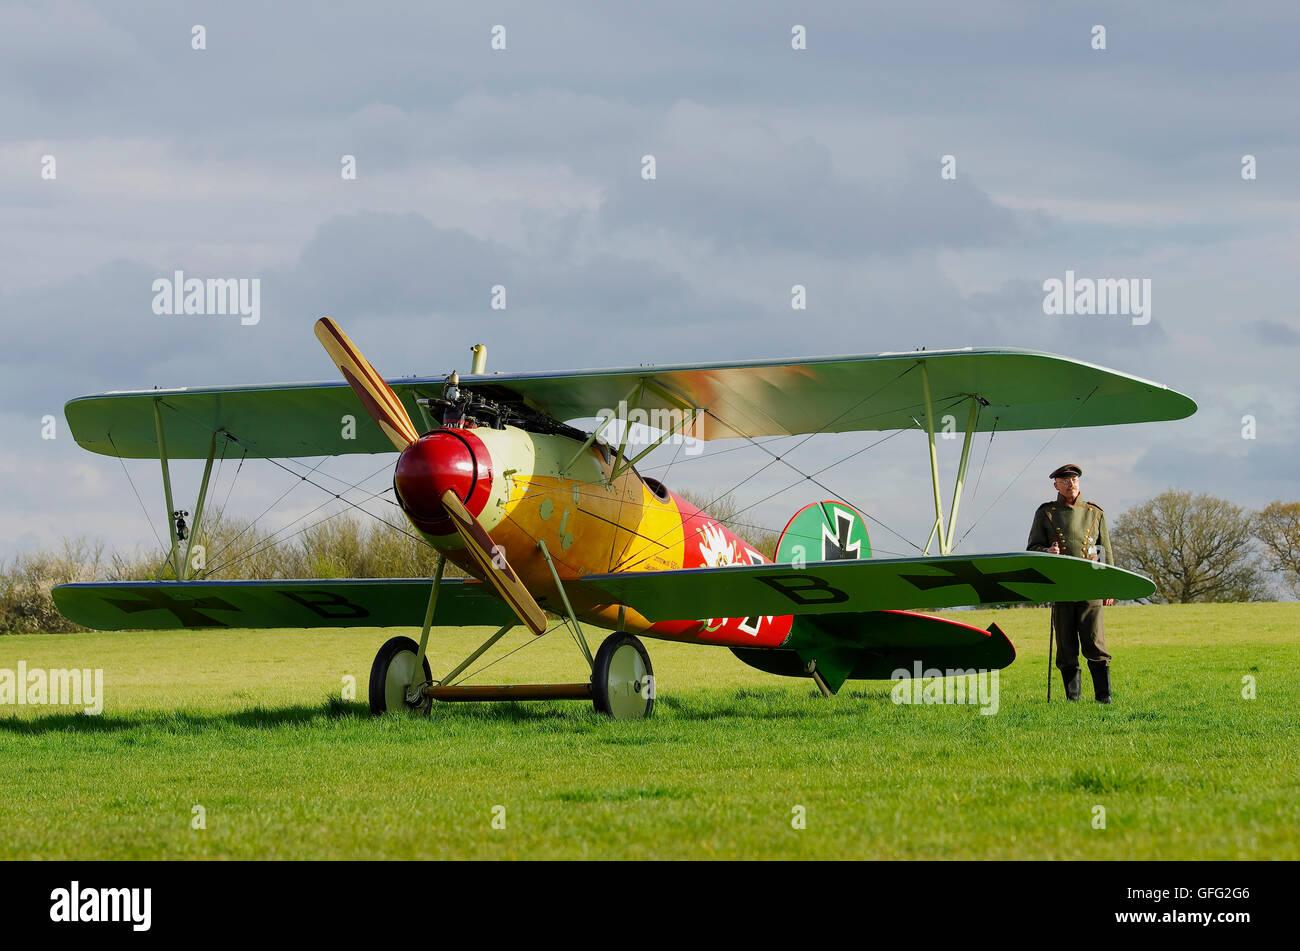 Albatross DVa replica at Stow Maries Aerodrome Essex - Stock Image